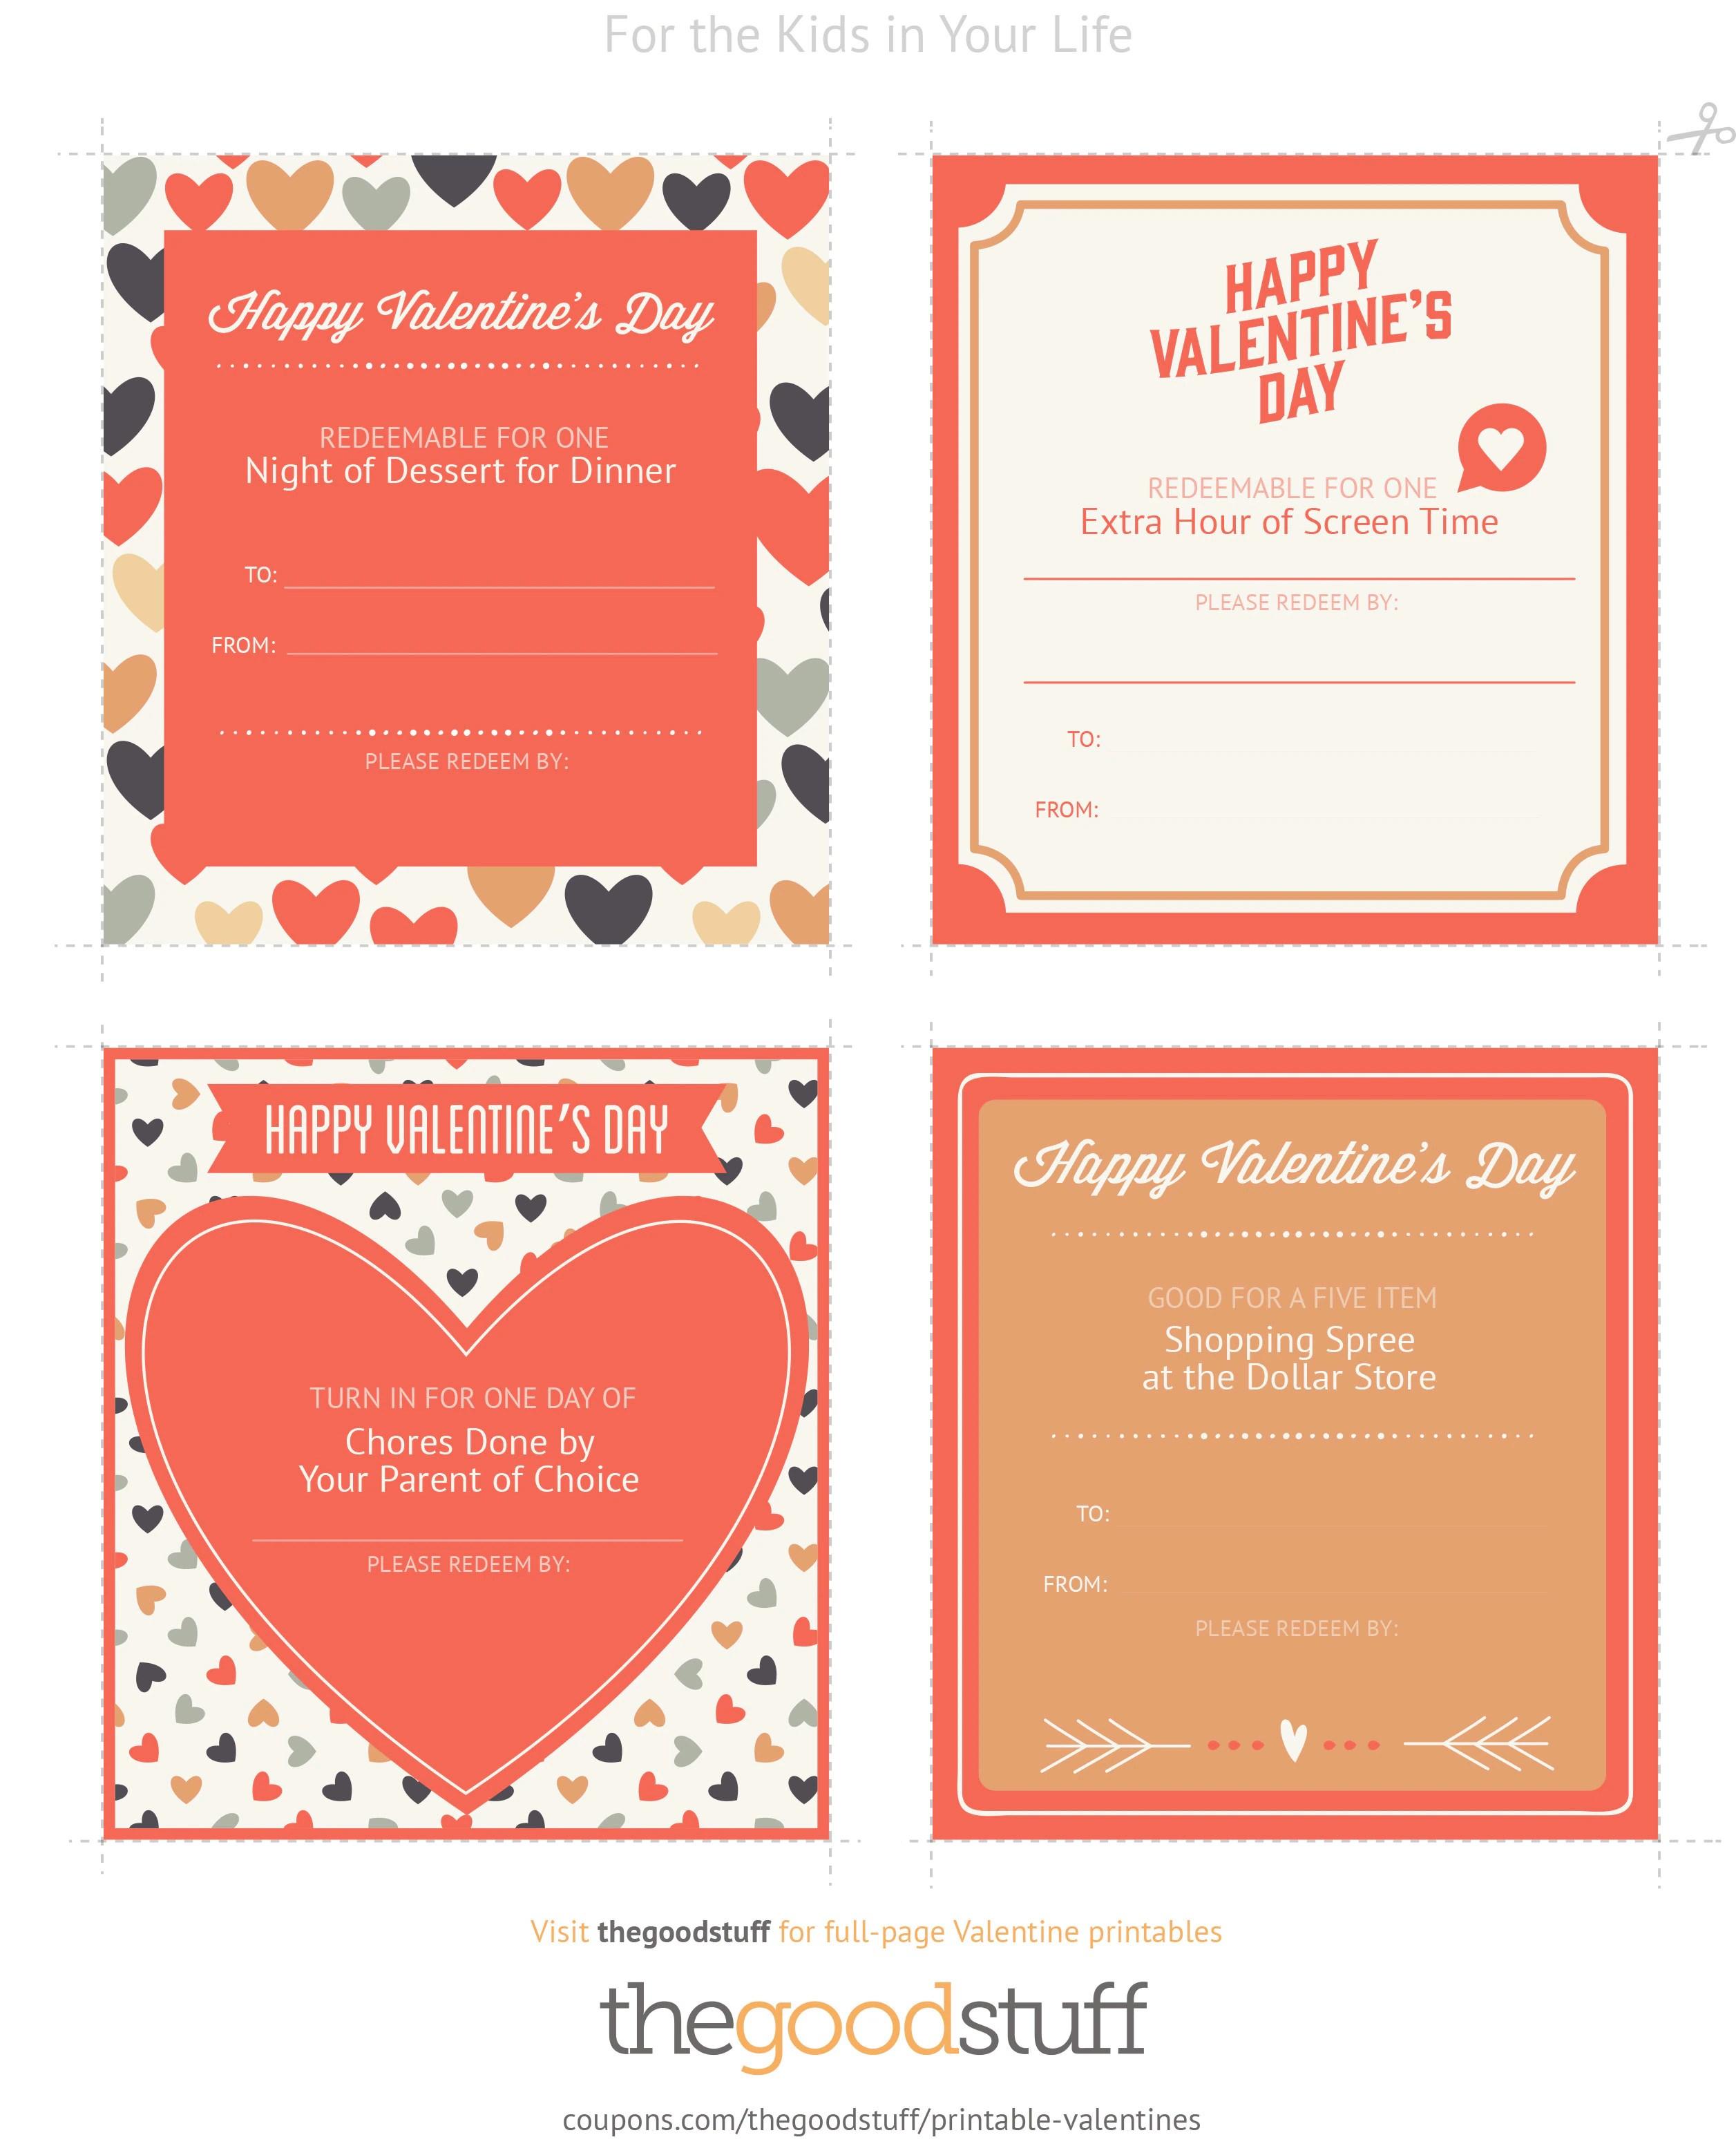 Exclusive Printable Valentine Coupons